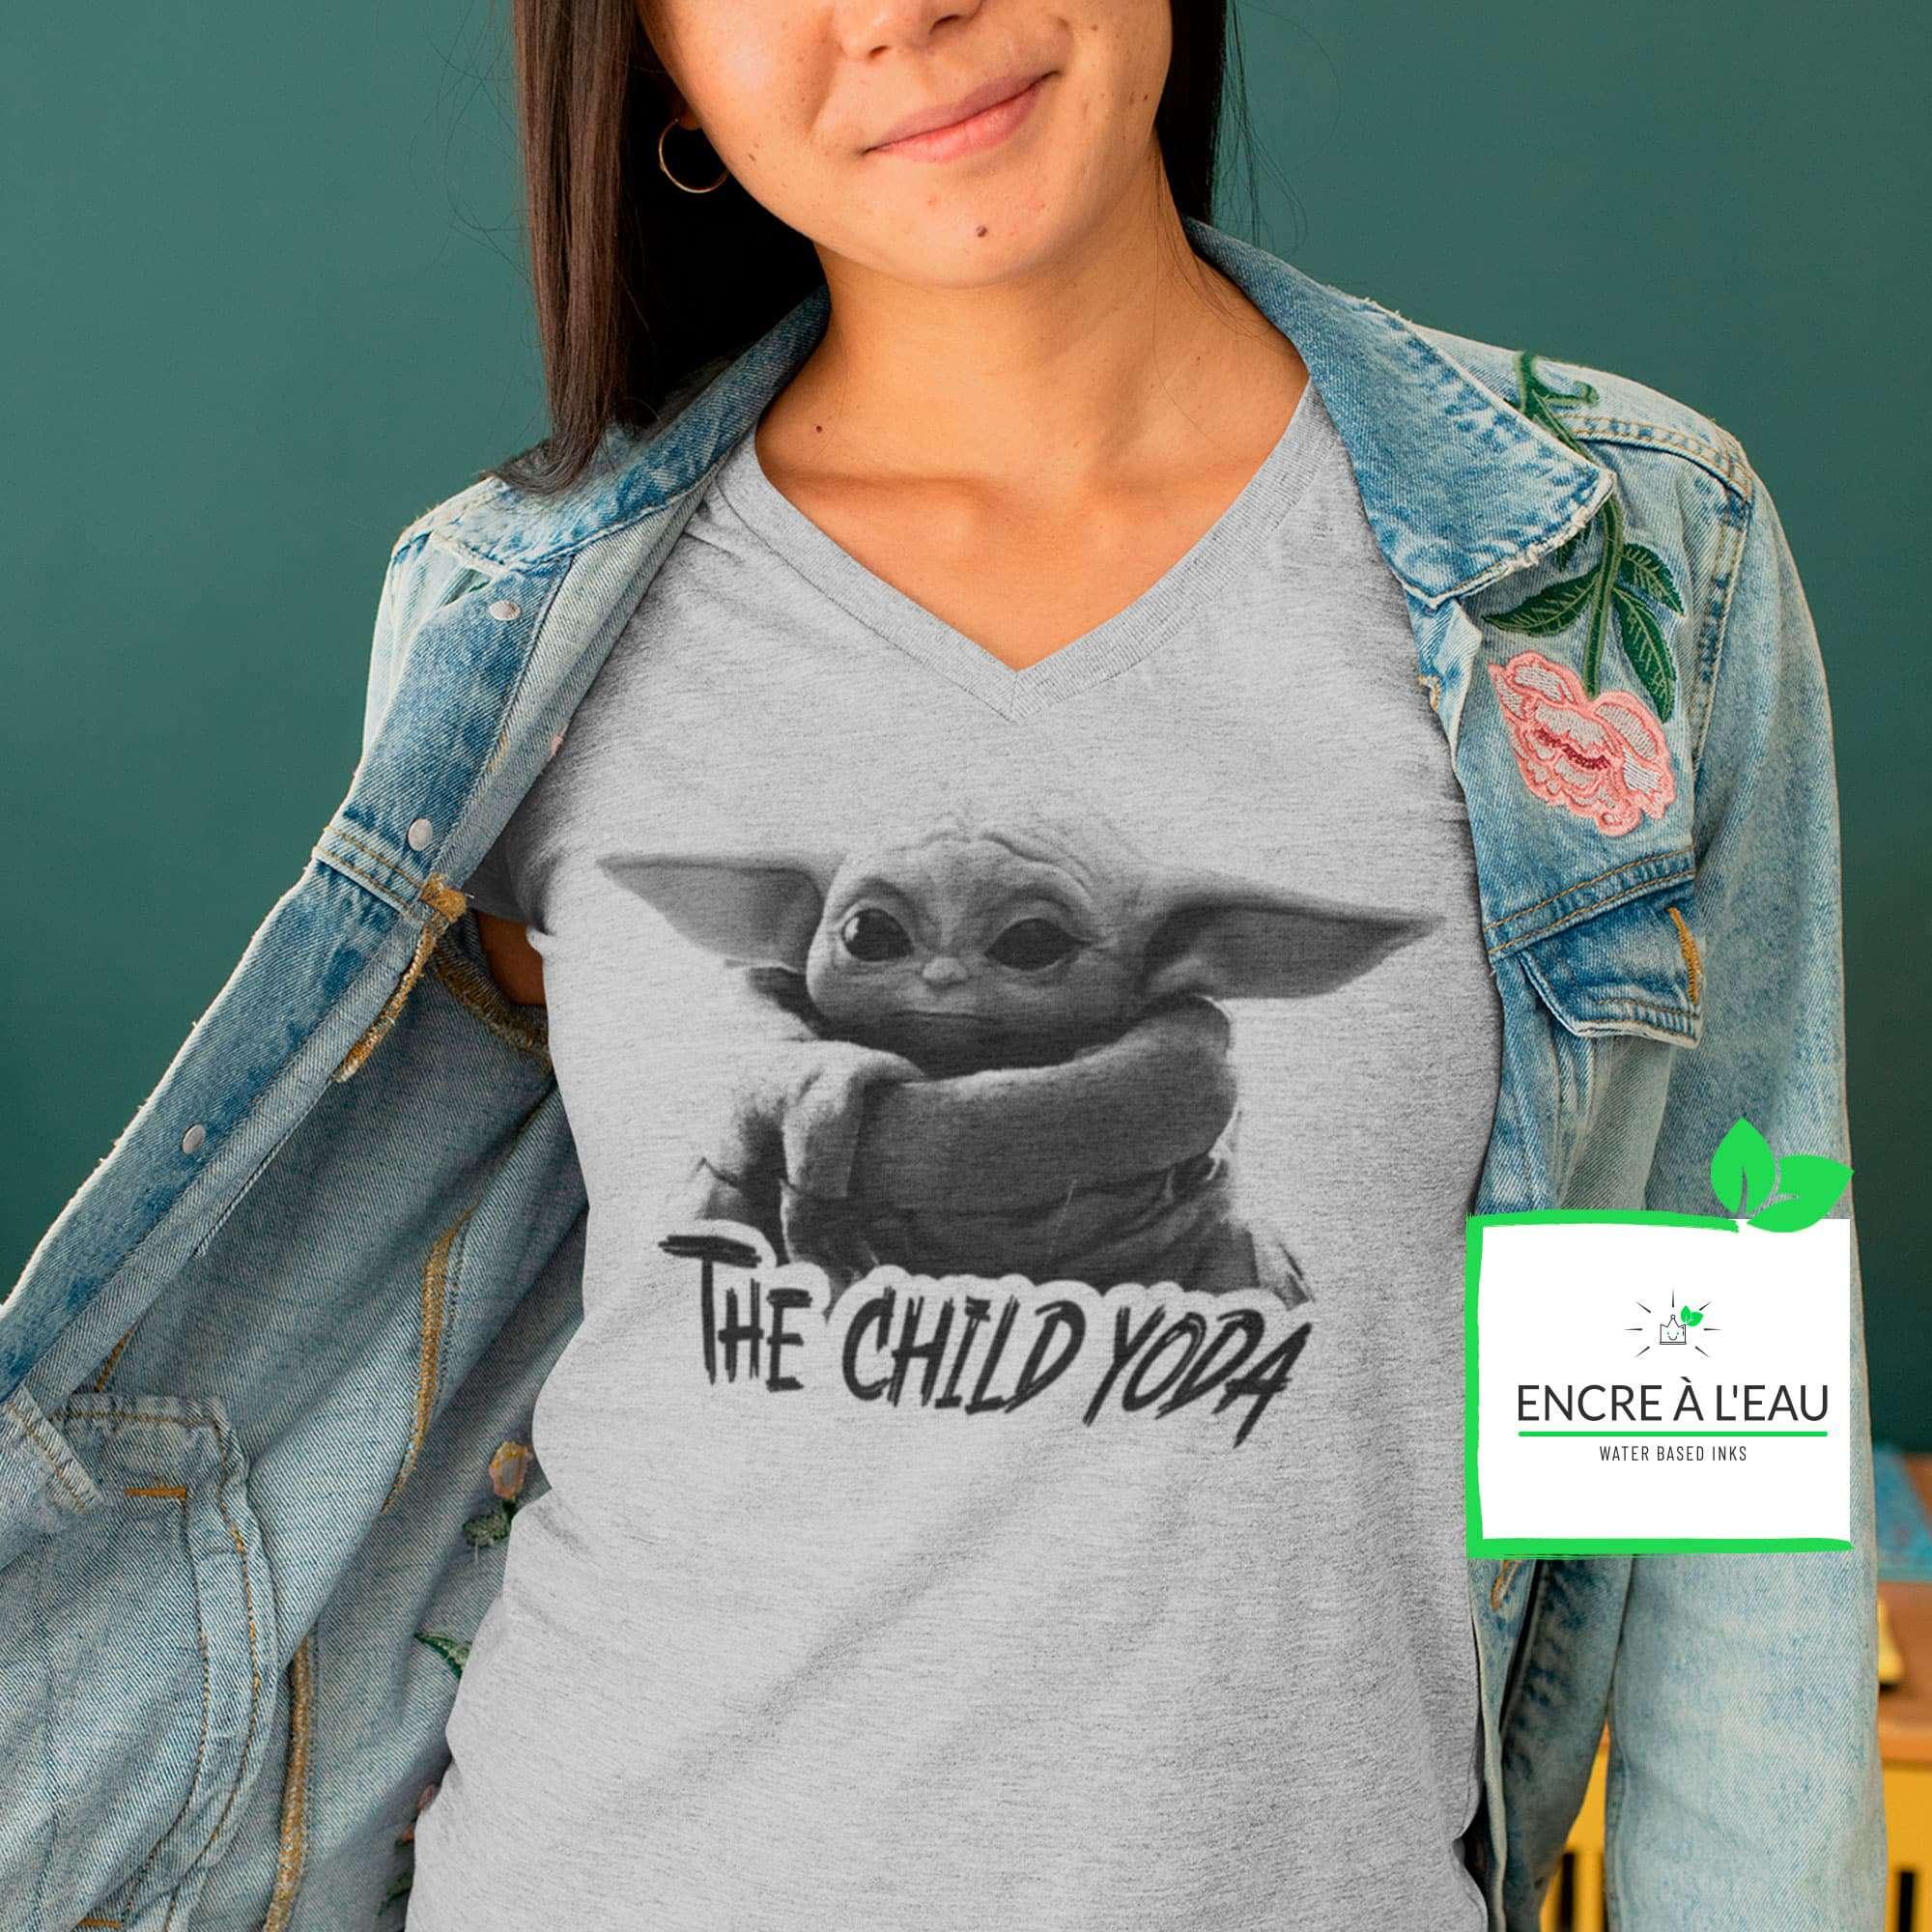 The Child YODA tshirt pour femme